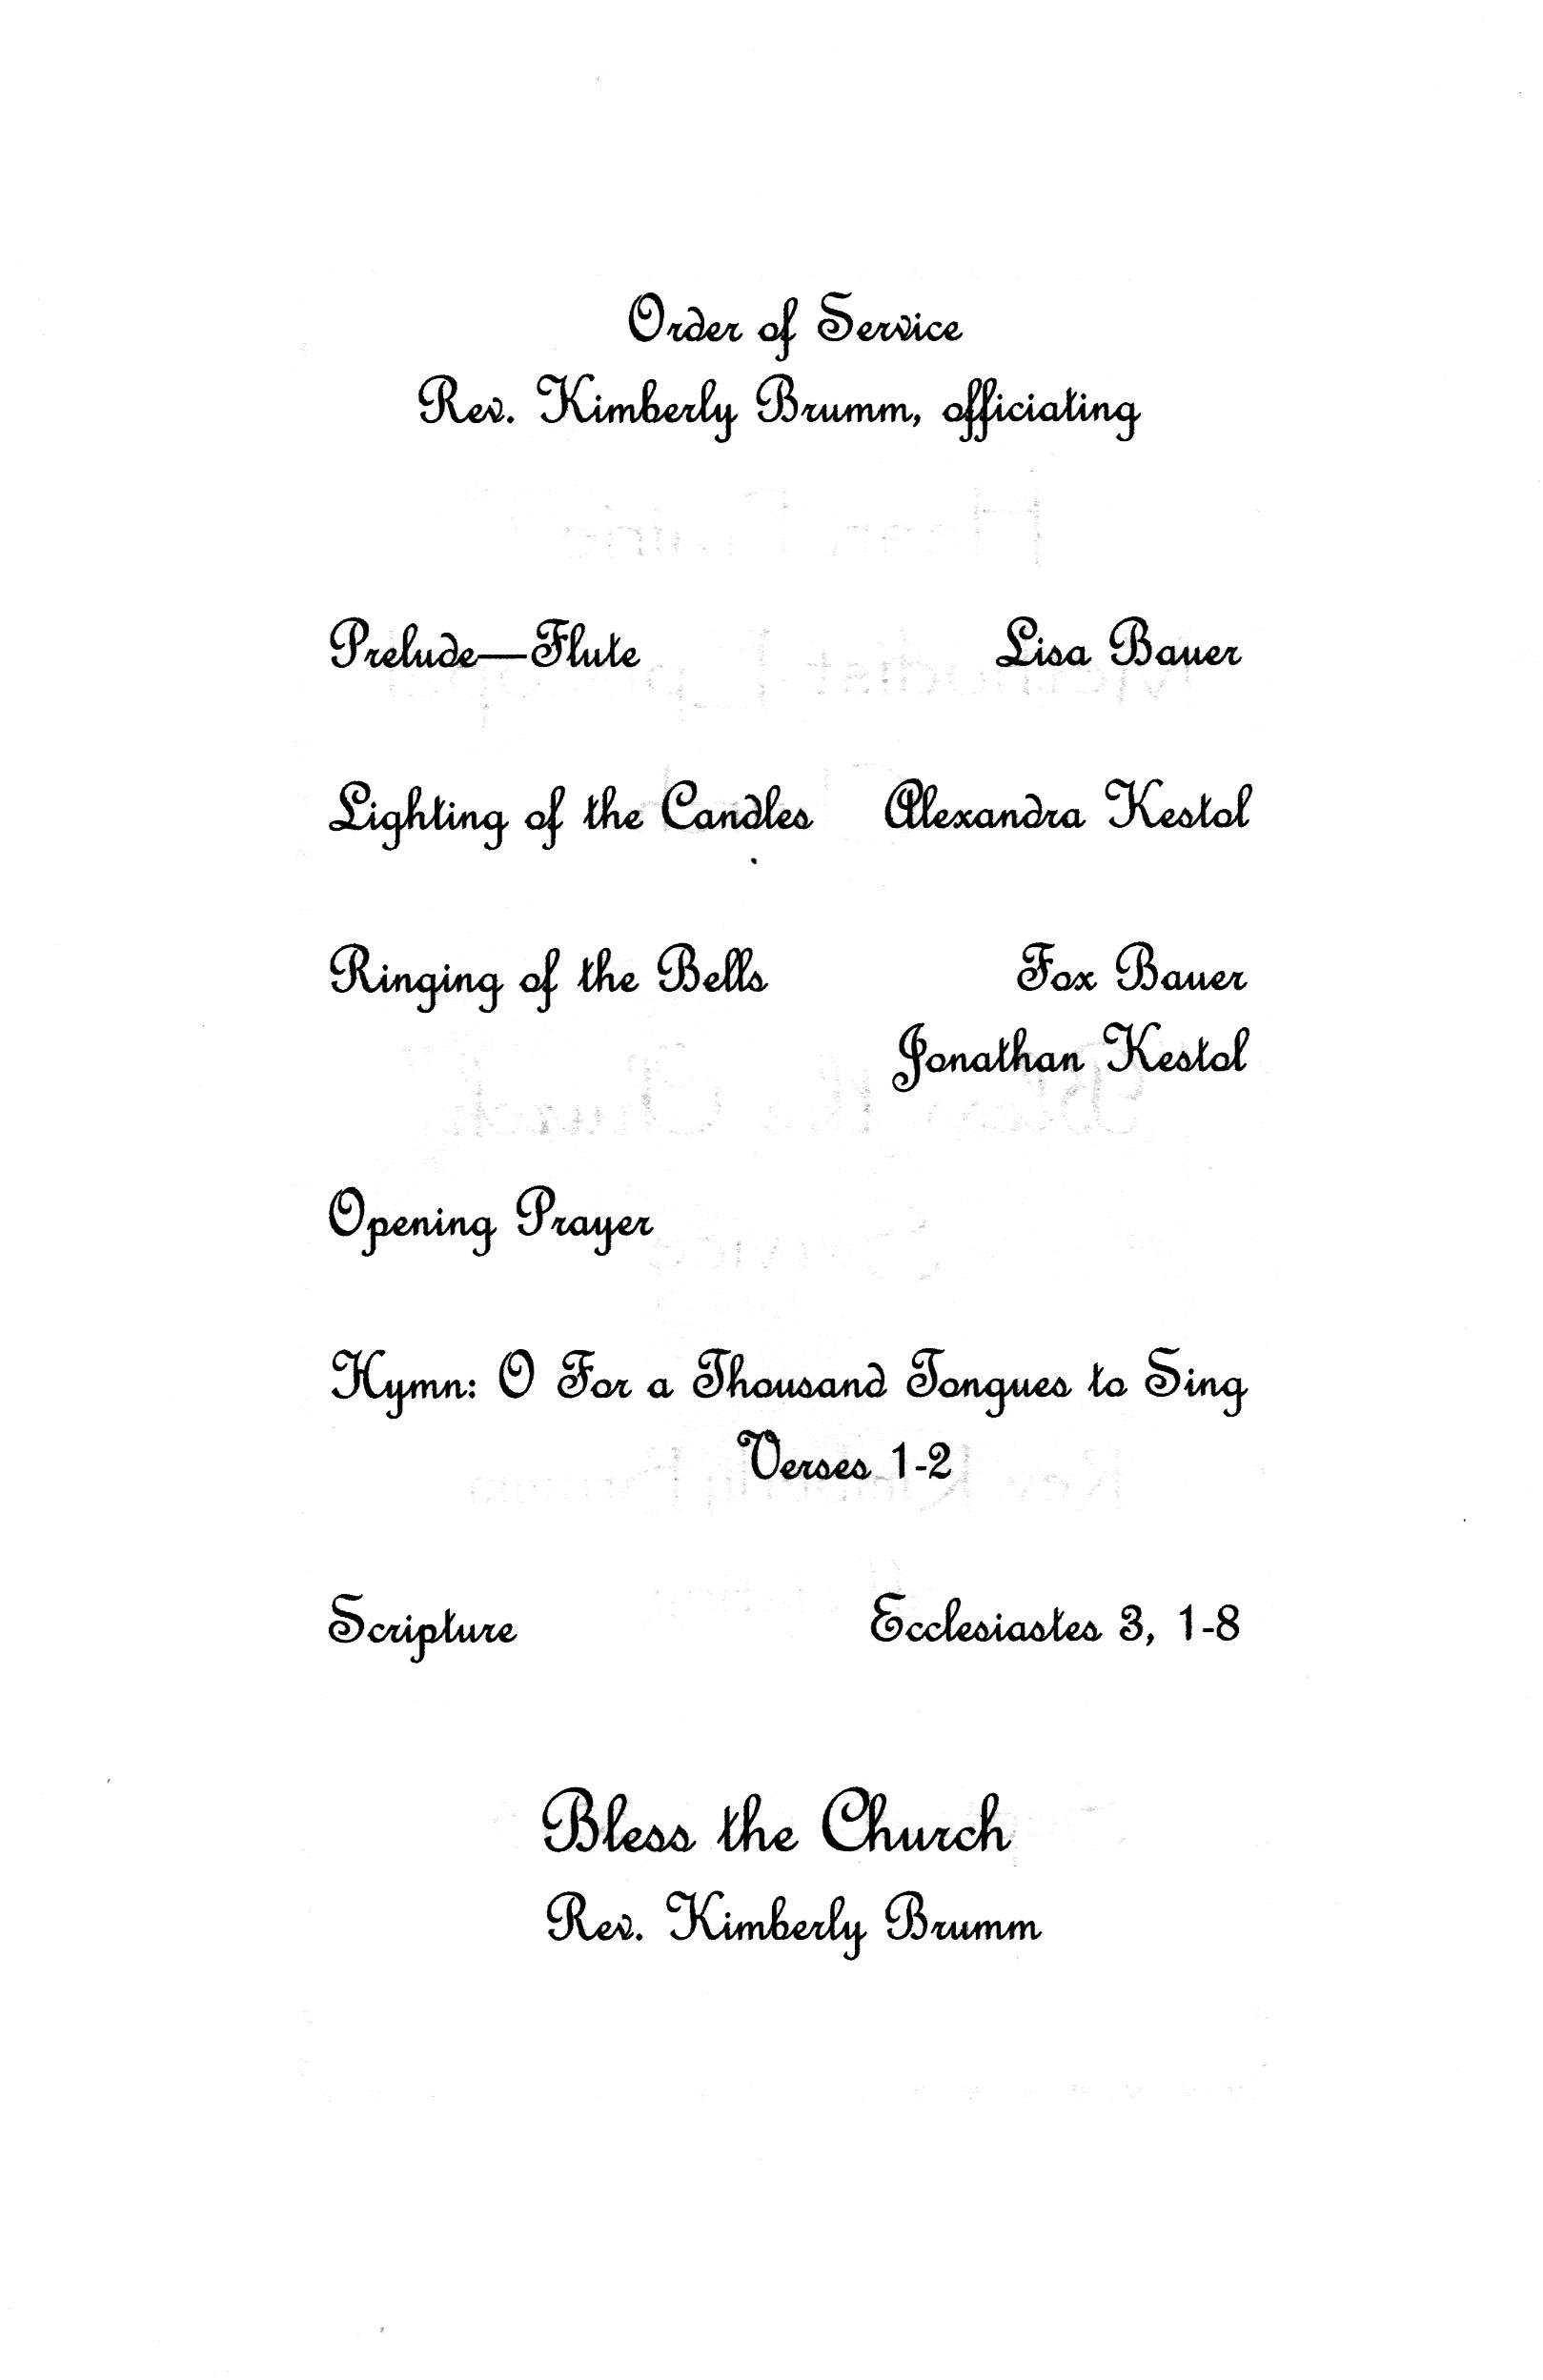 Bless the Church Program 02 – The Norwegian American Methodist ...